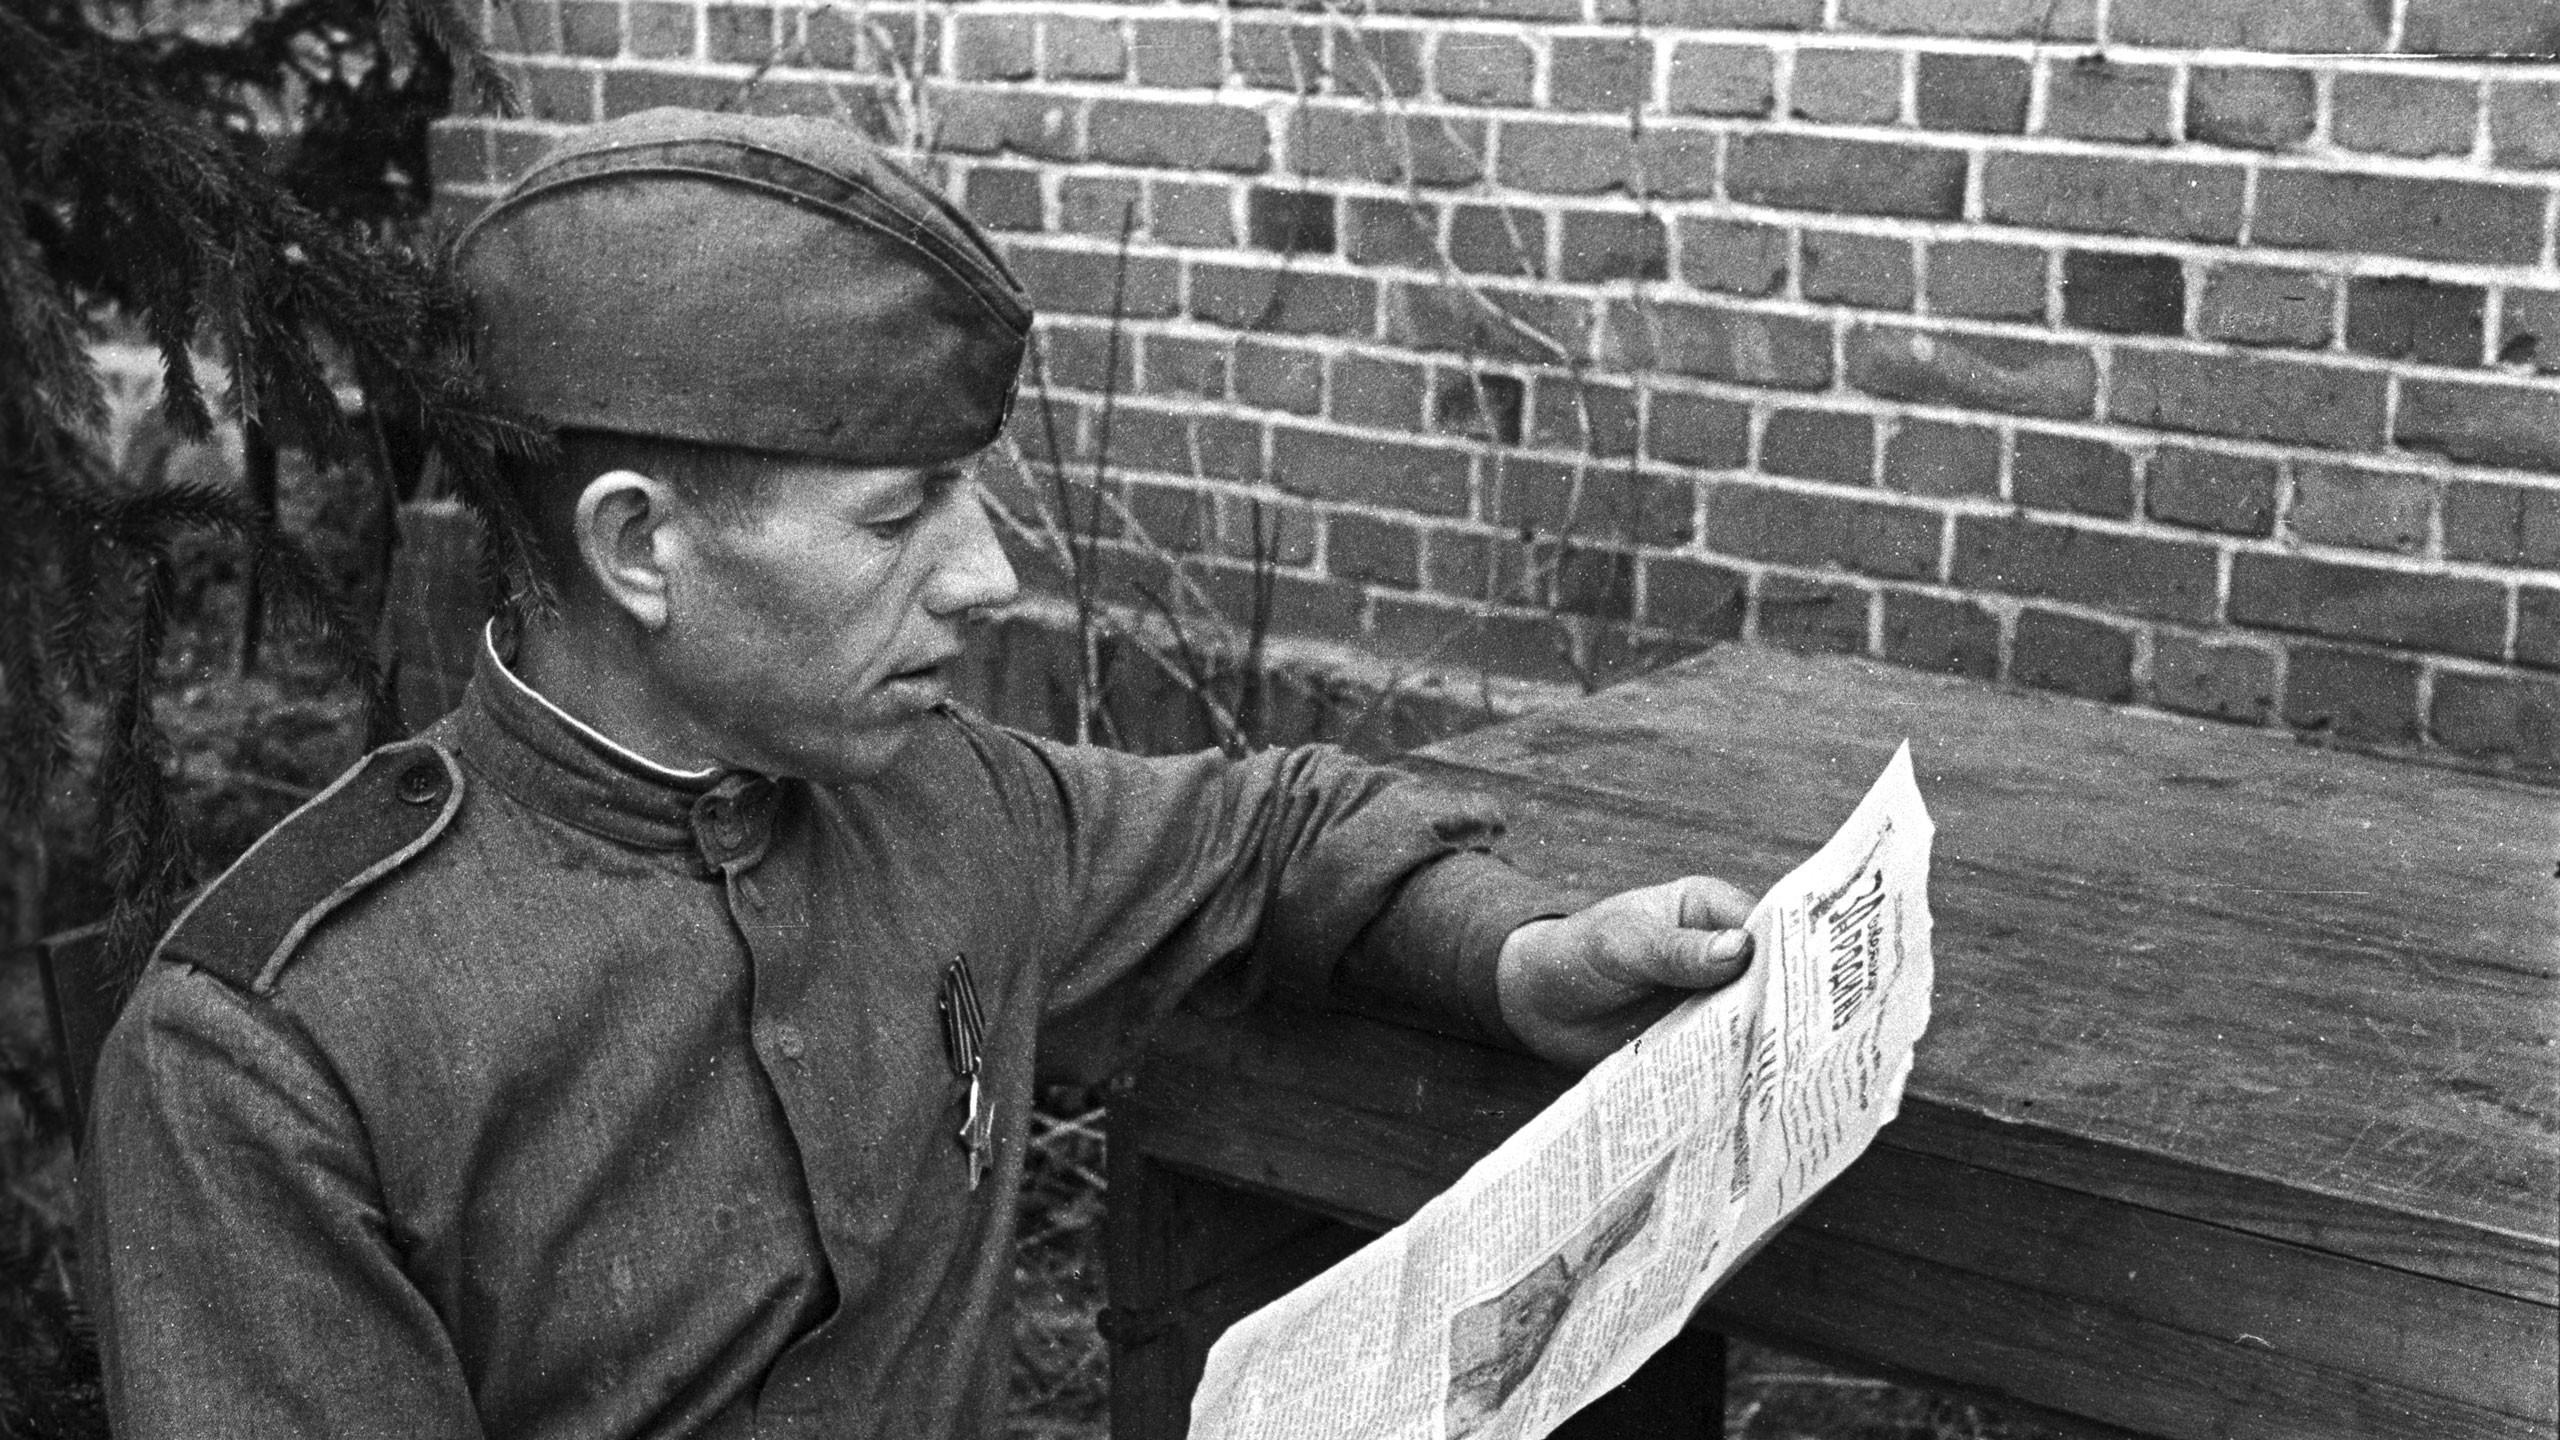 Солдат читающий письмо картинки